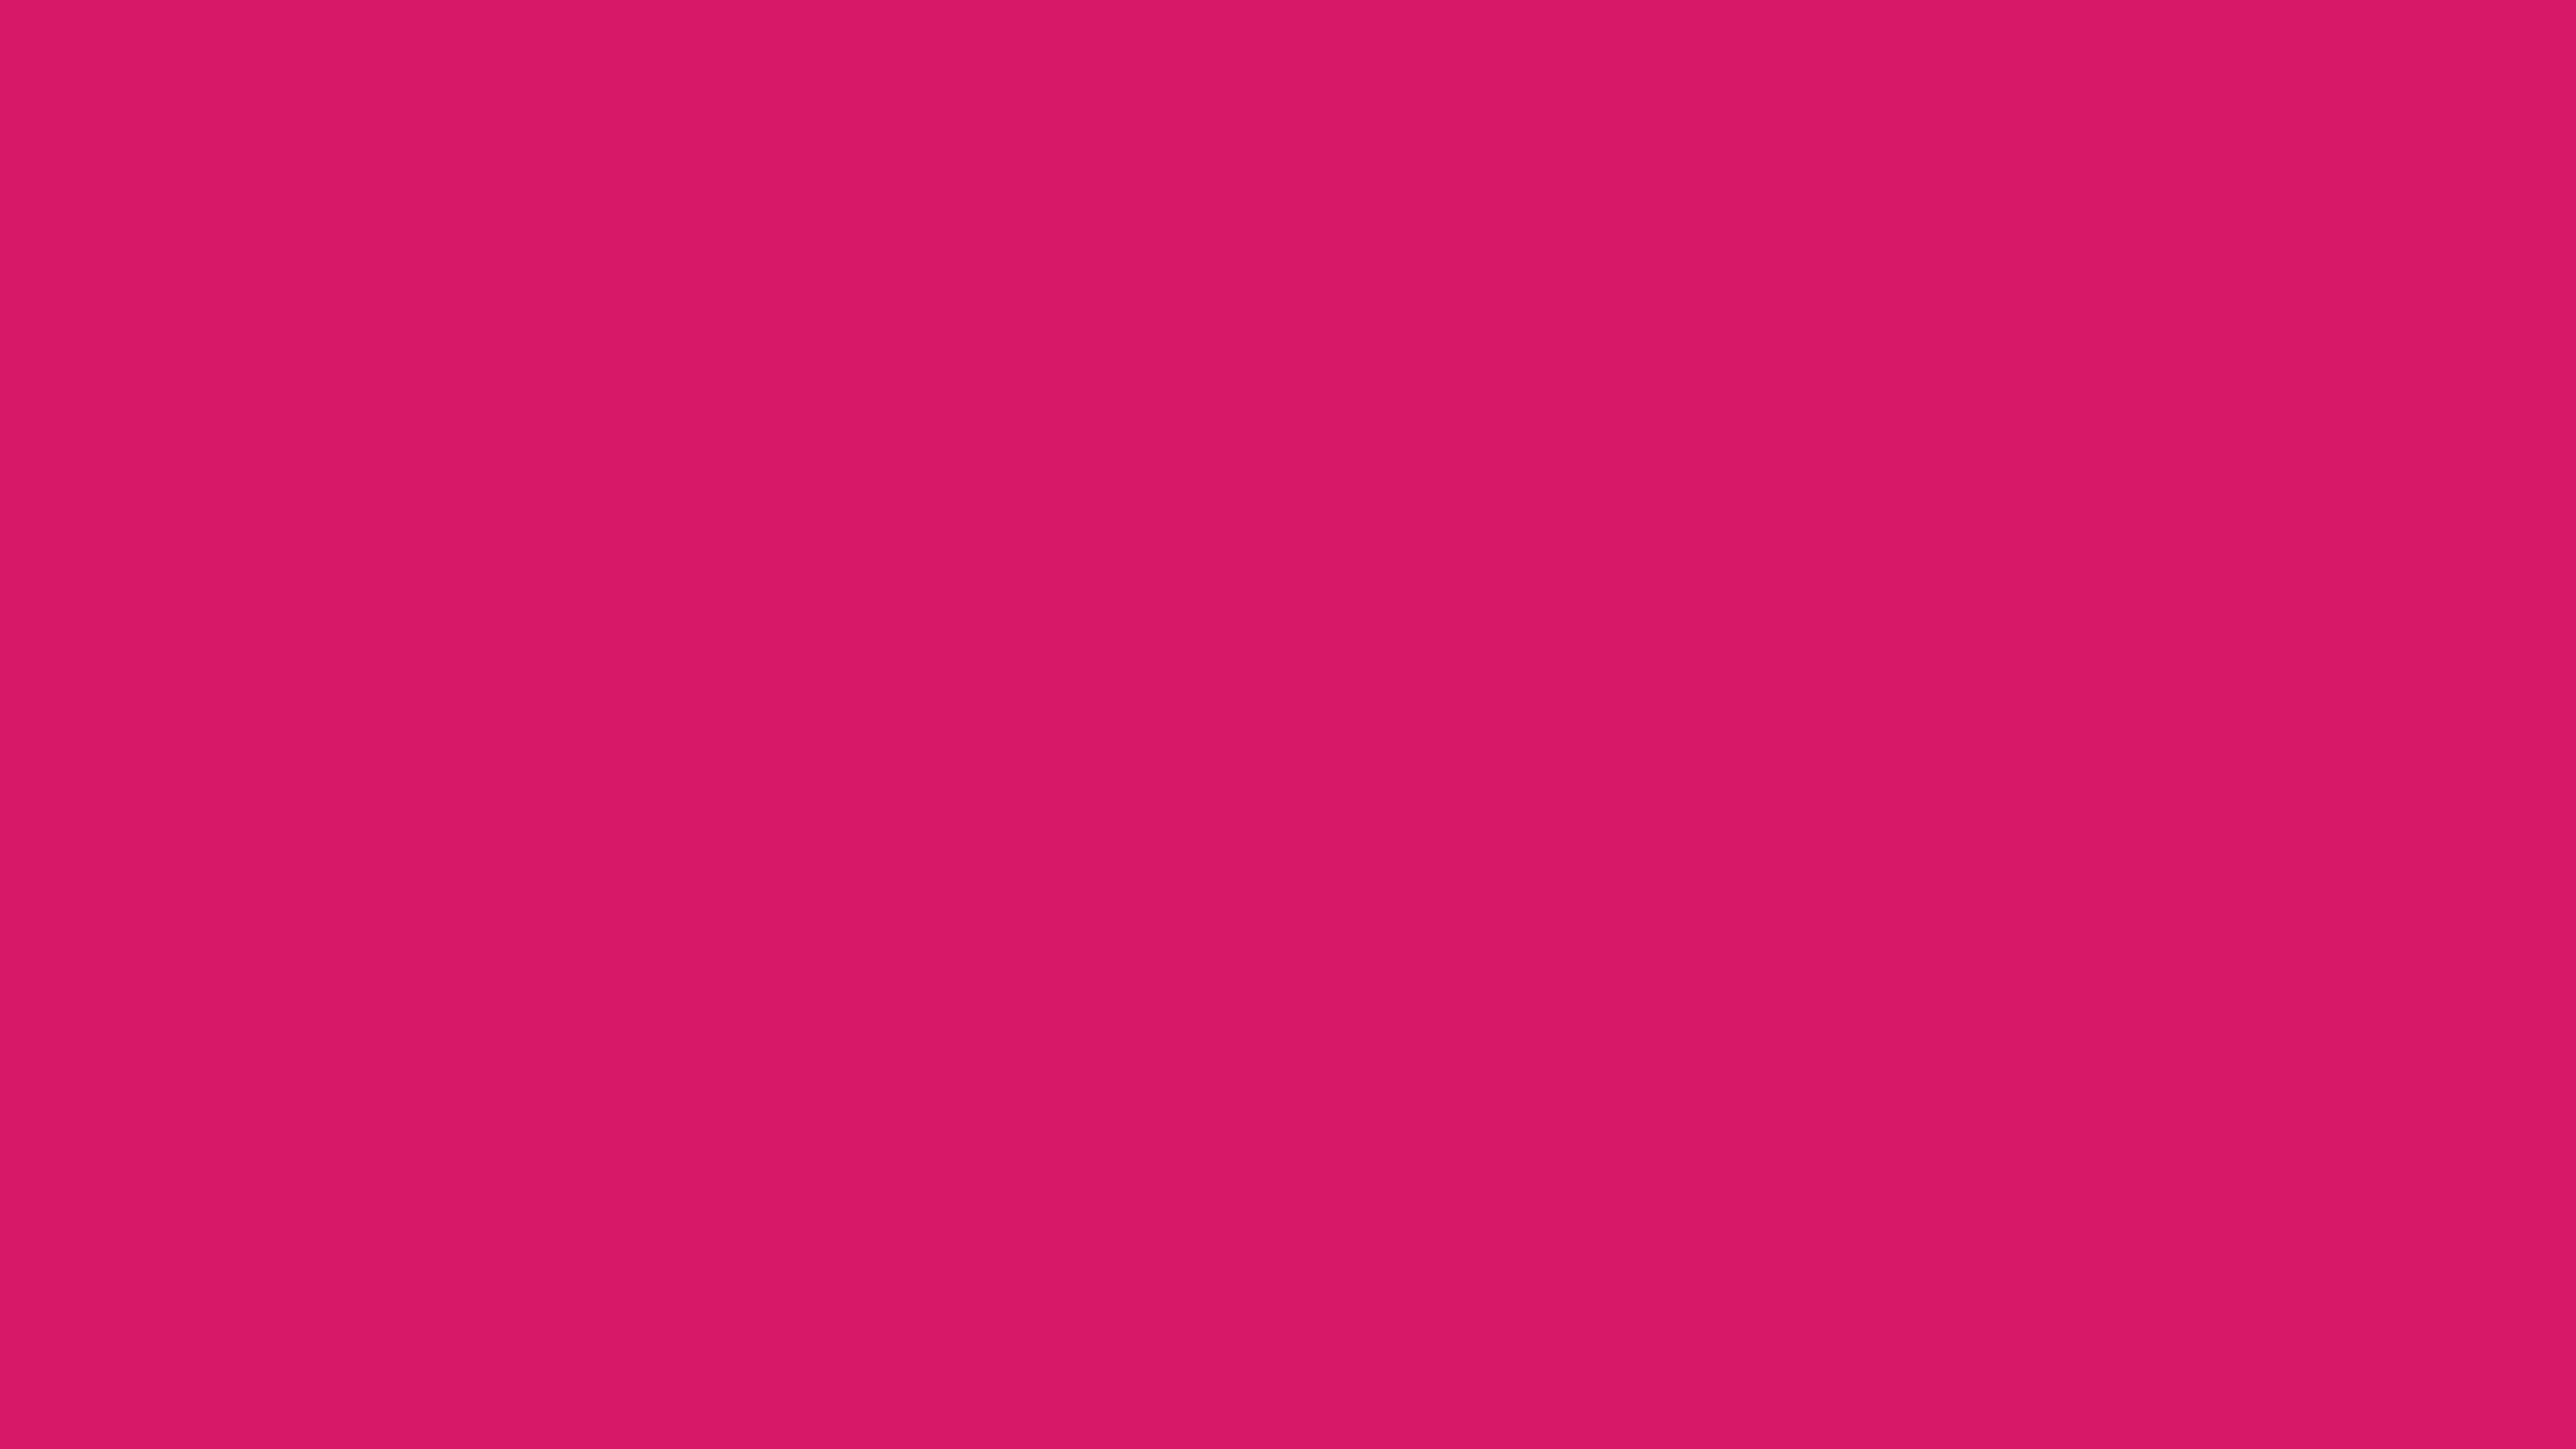 7680x4320 Dogwood Rose Solid Color Background